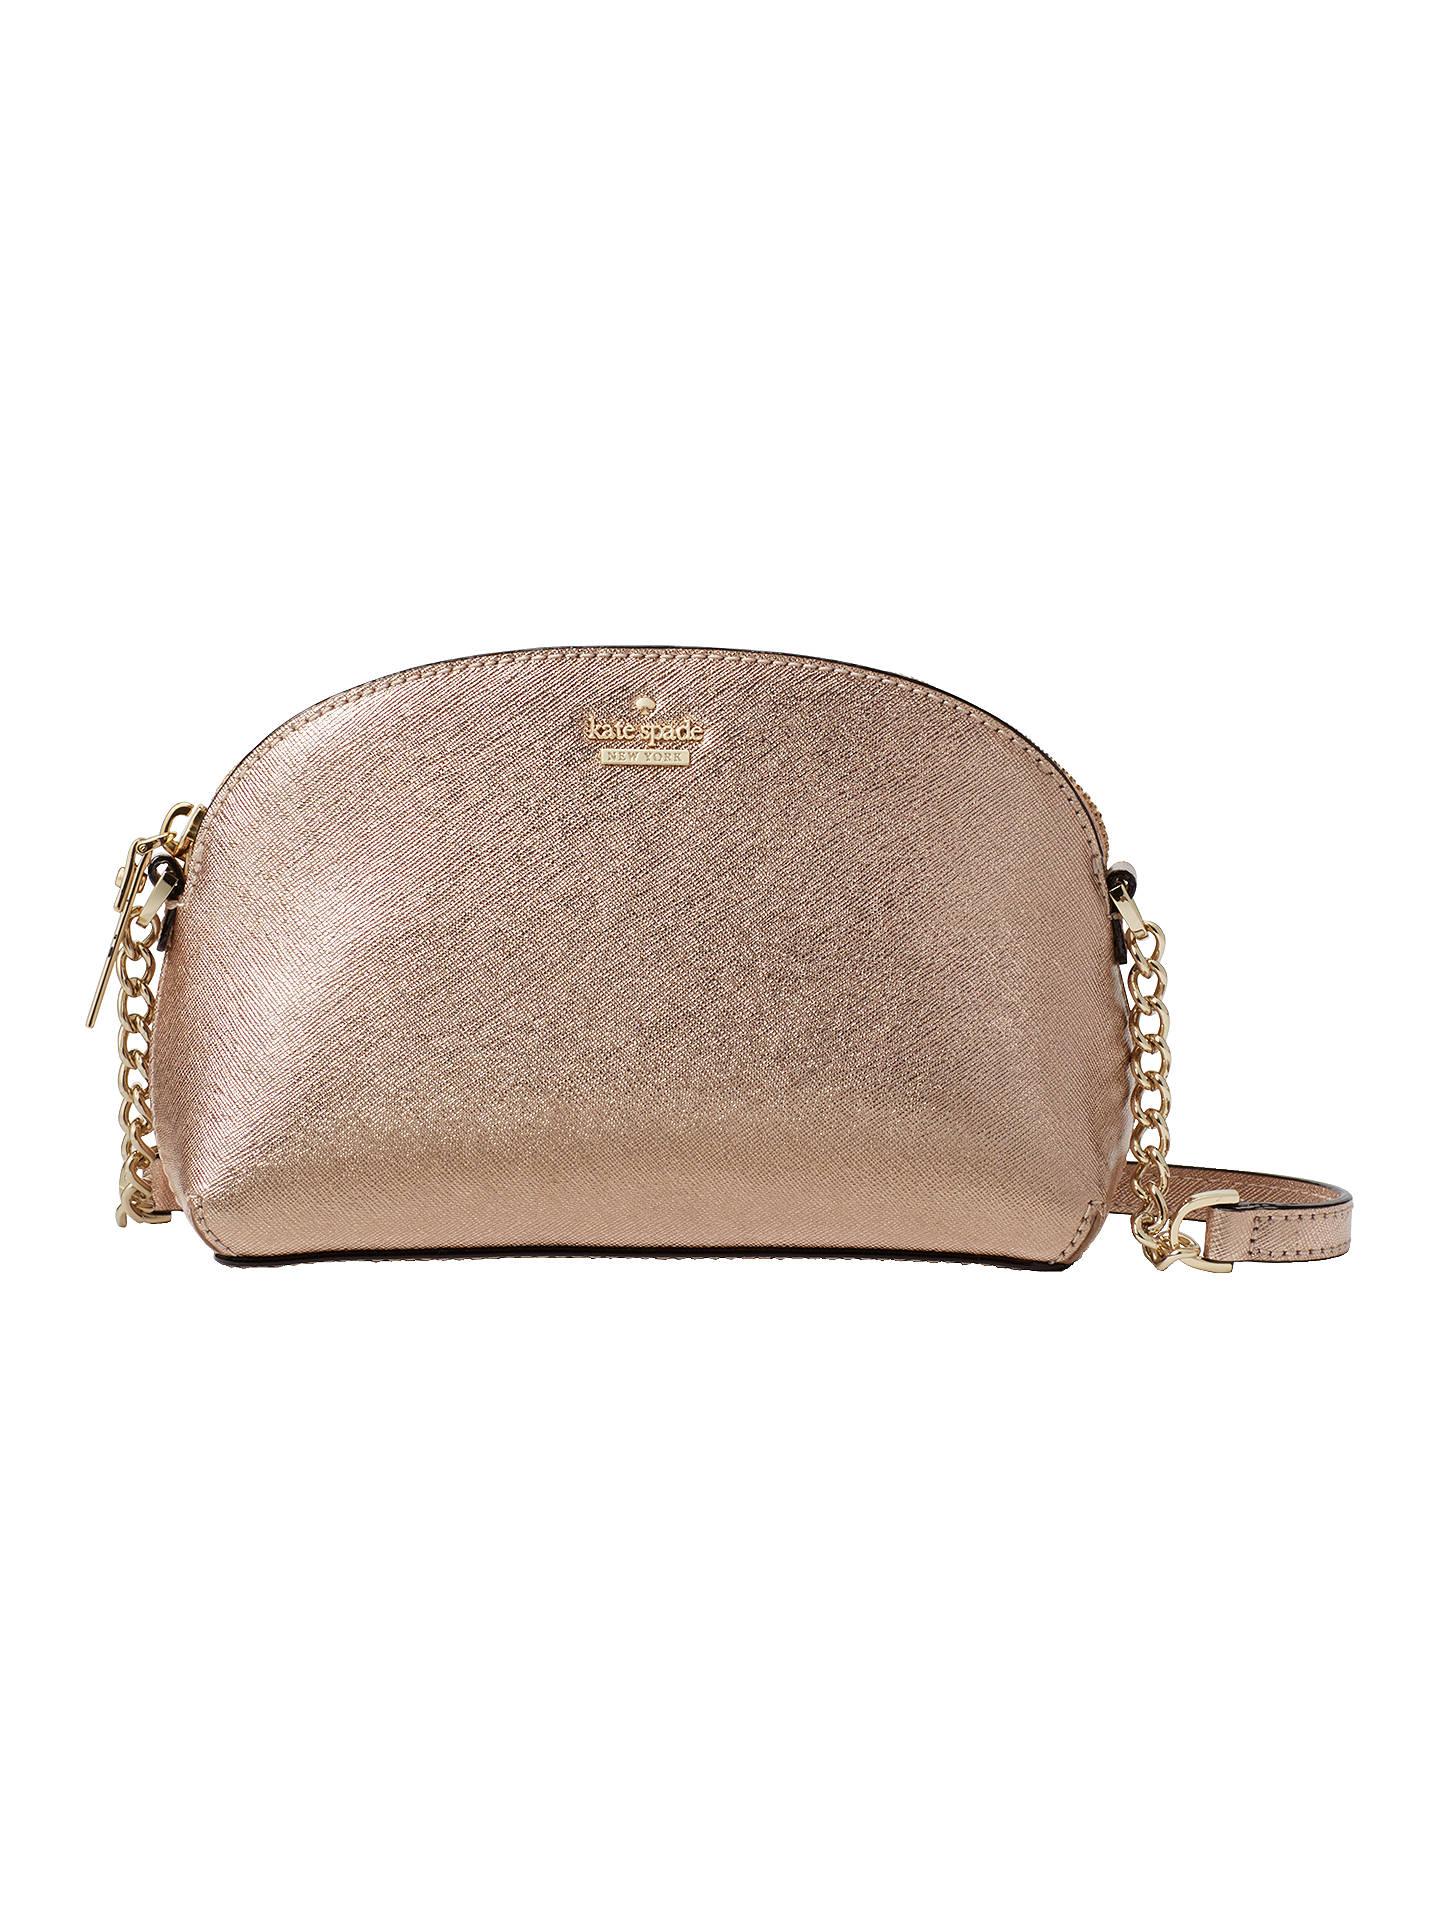 e90e79aba Buy kate spade new york Cameron Street Hilli Cross Body Bag, Rose Gold  Online at ...